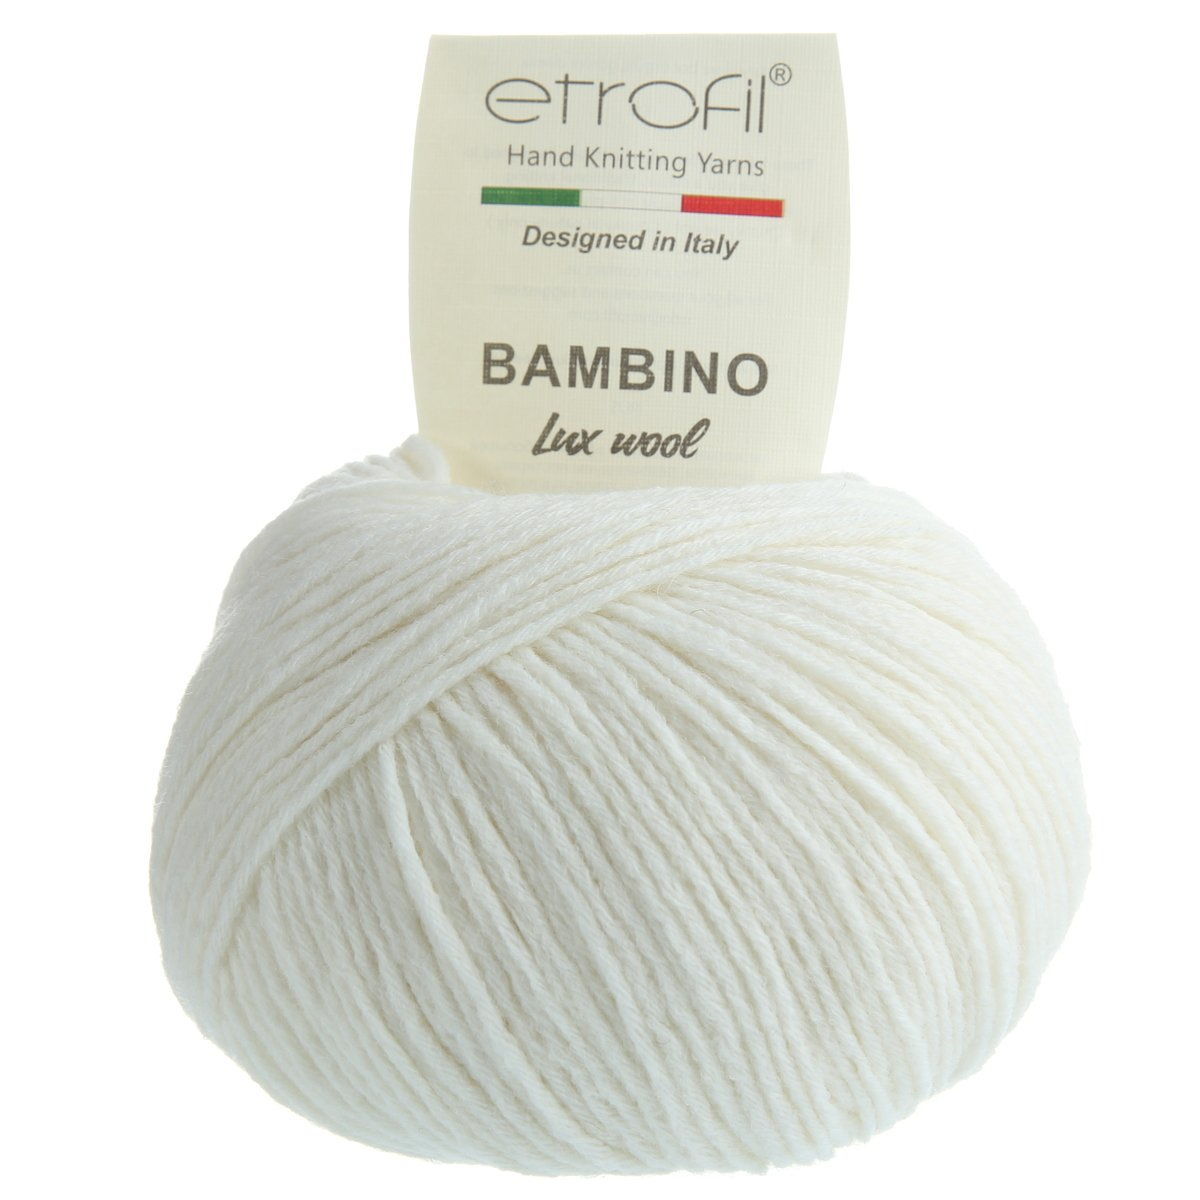 Etrofil Bambino Lux Wool (Этрофил Бамбино Люкс Вул) 70014 - белый купить в Беларуси